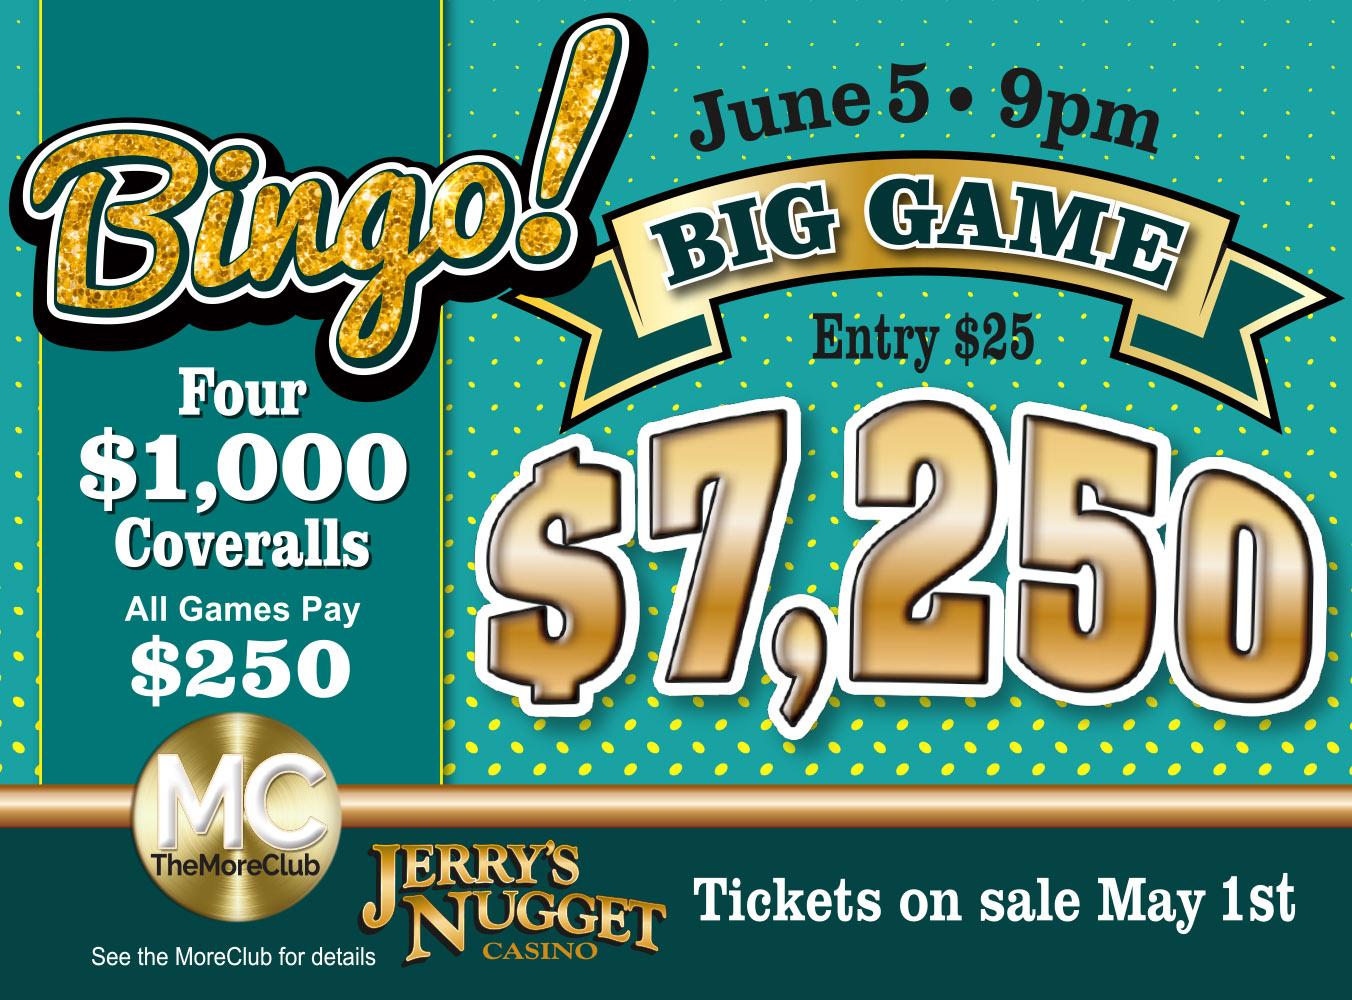 $7,250 Bingo Big Game